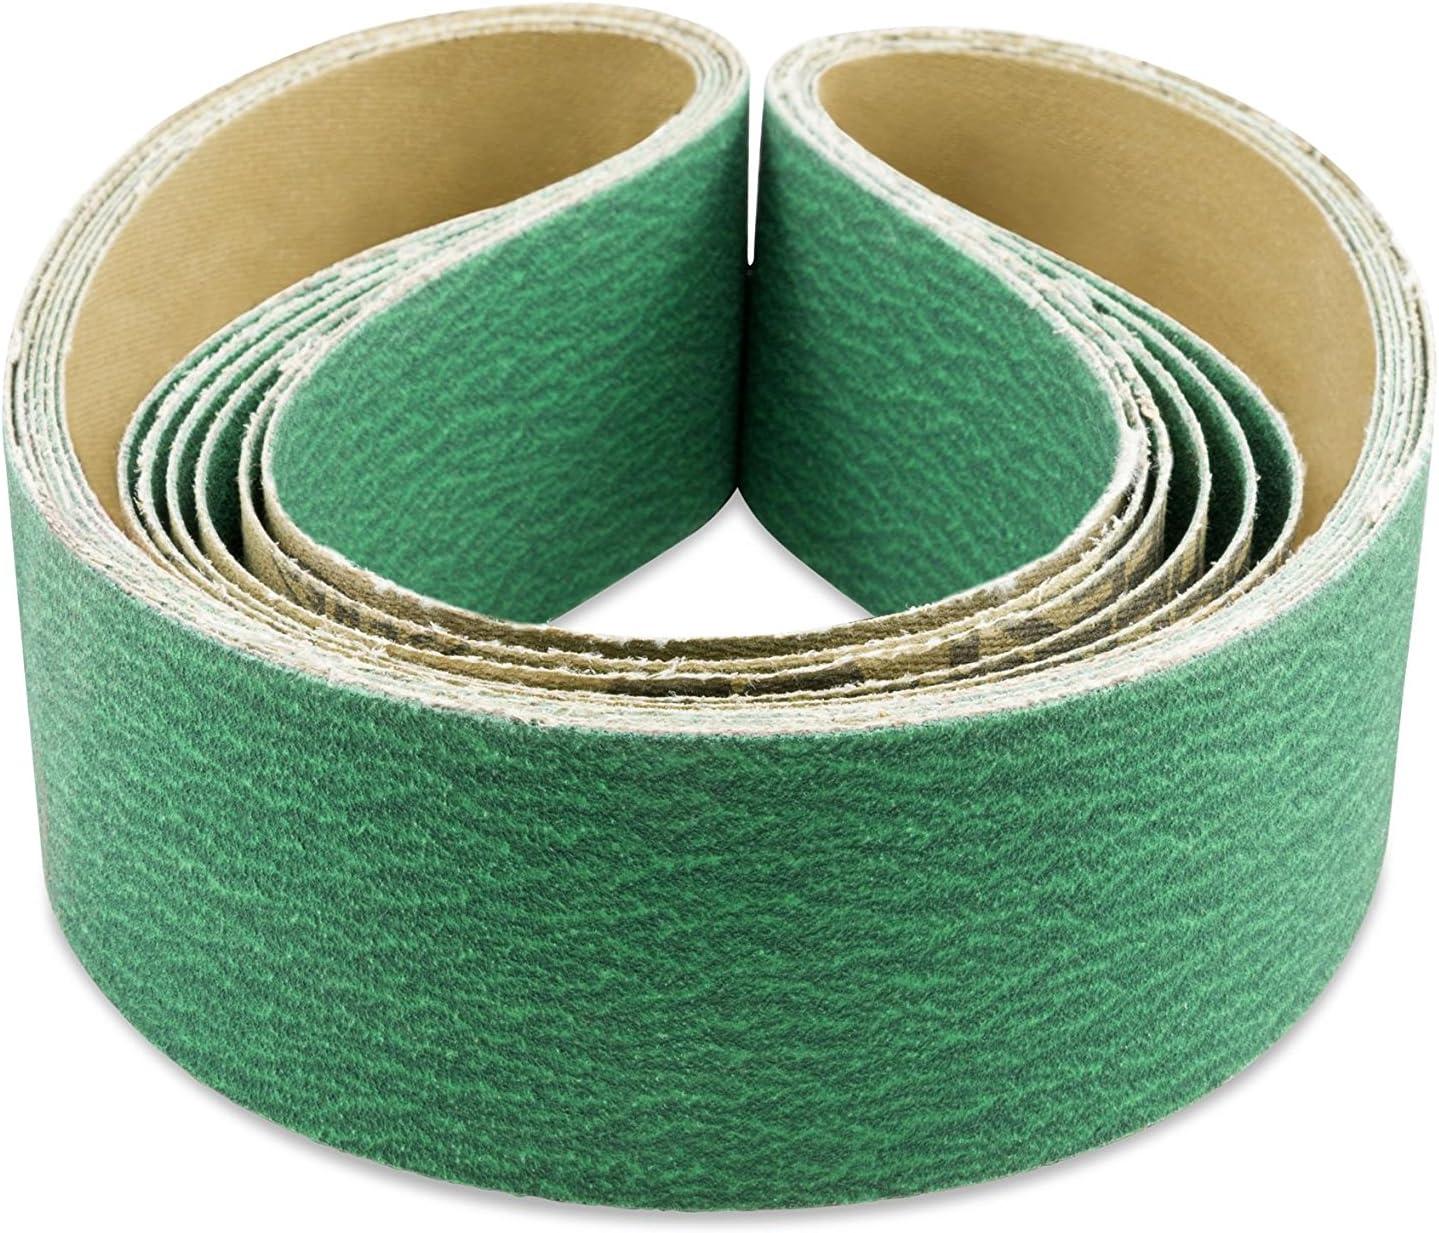 1-1//8-Inch x 21-Inch Zirconia Abrasive Belt 40 Grit, 10 Pack